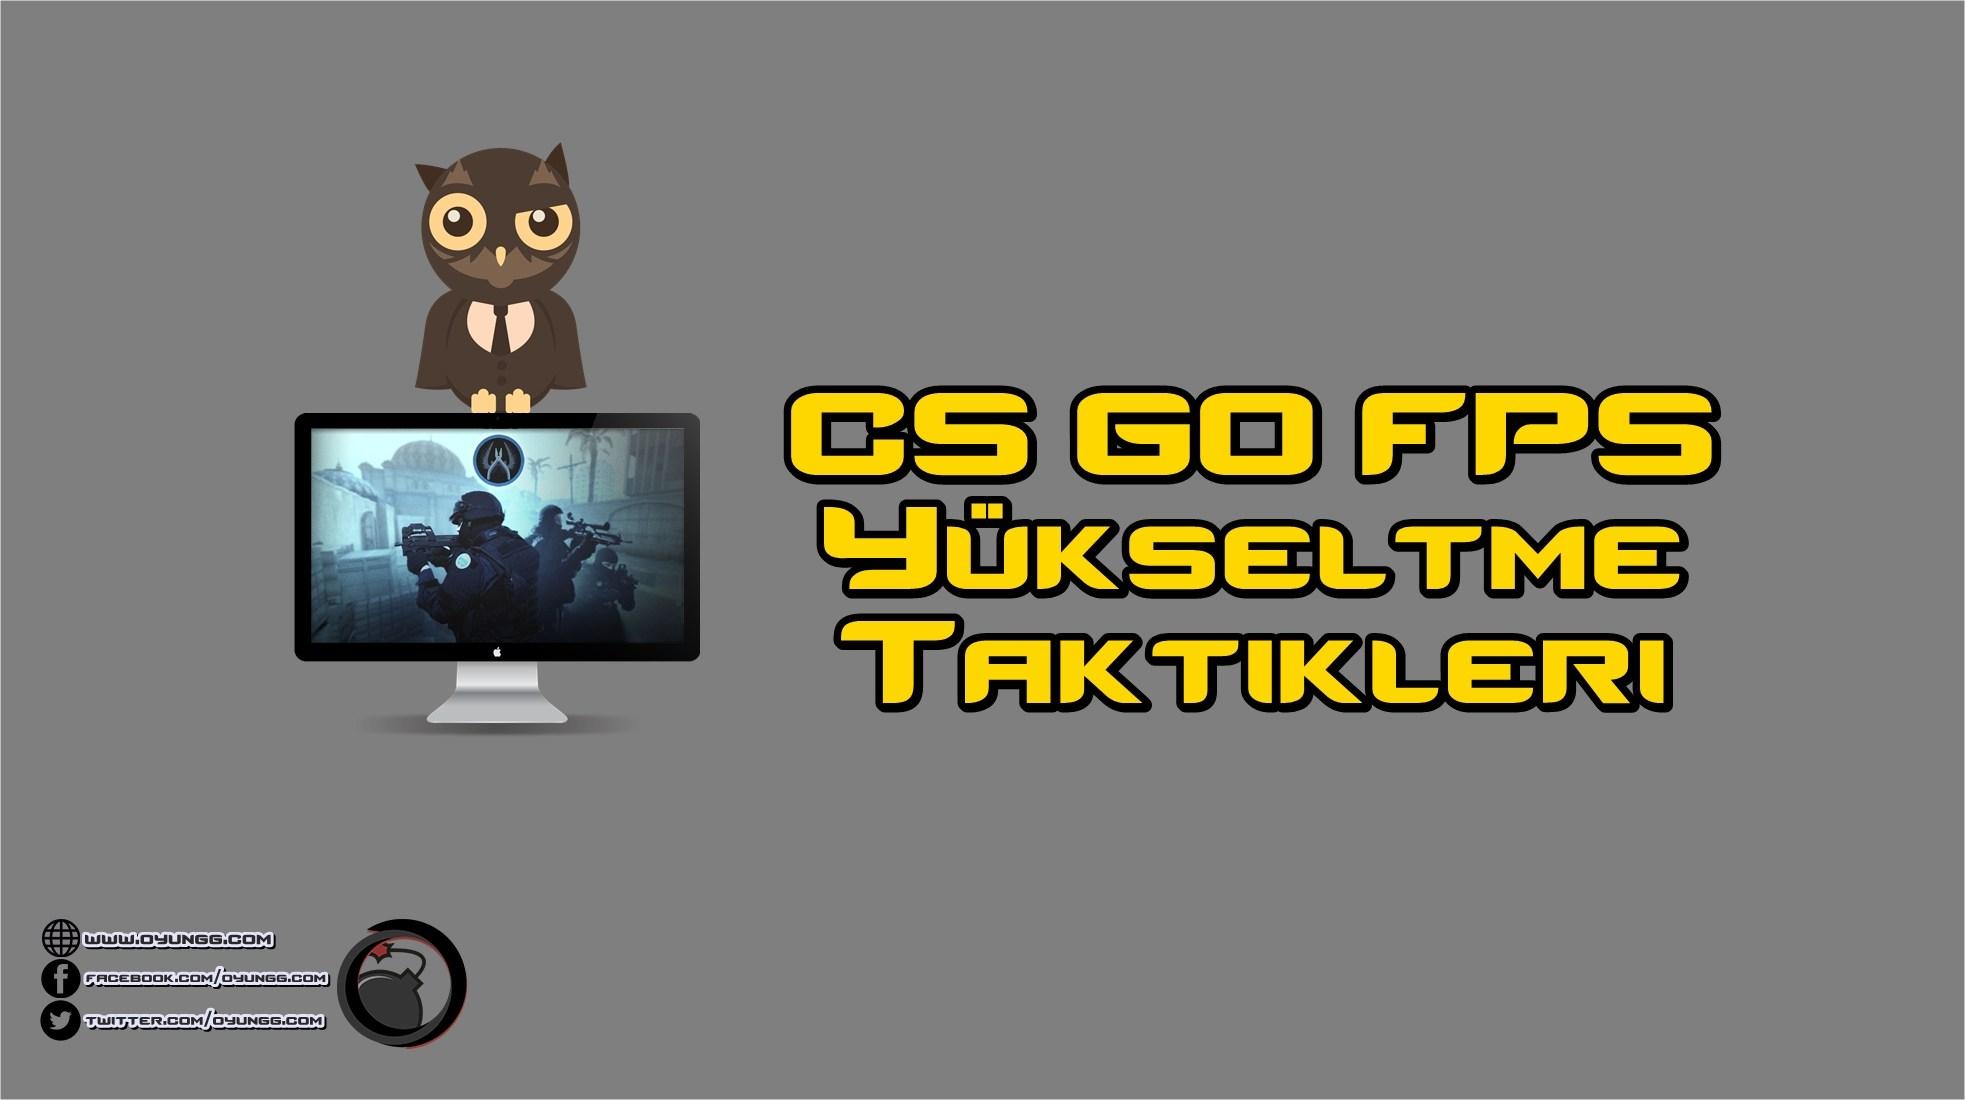 CS GO FPS Yükseltme Taktikleri